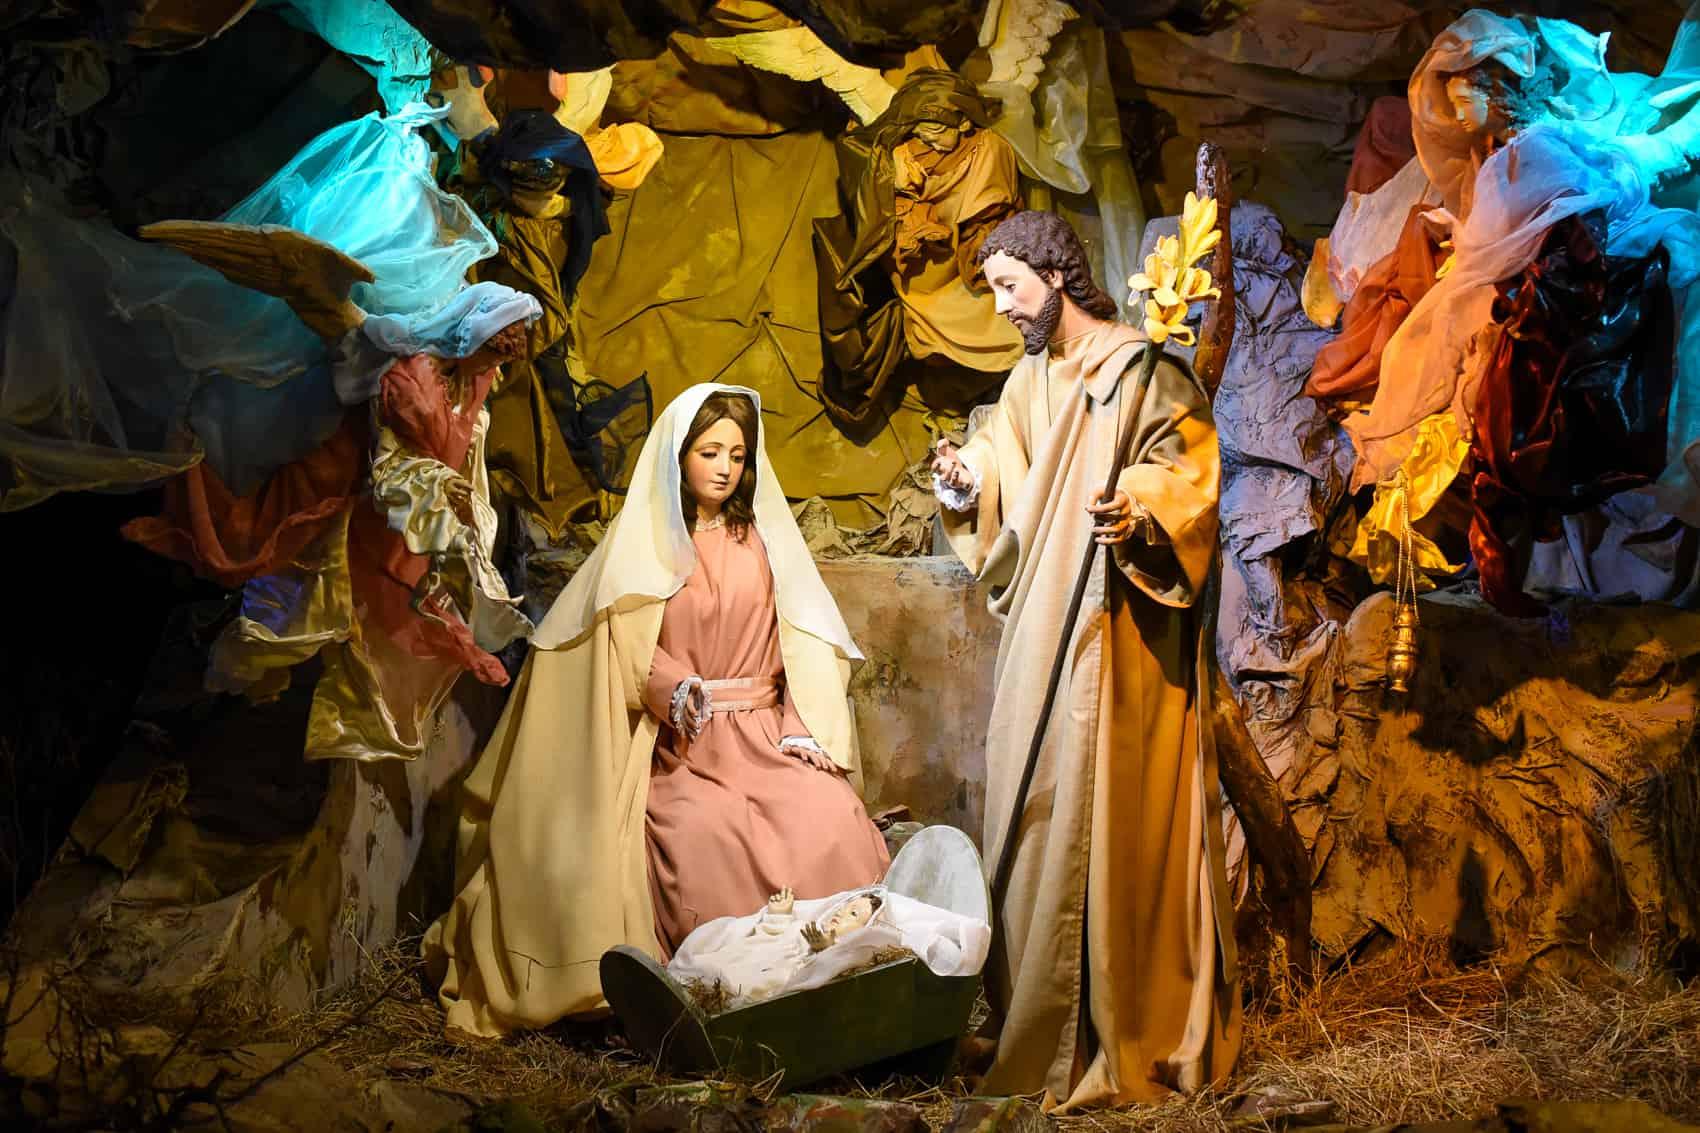 Costa Rica National Theater nativity scene